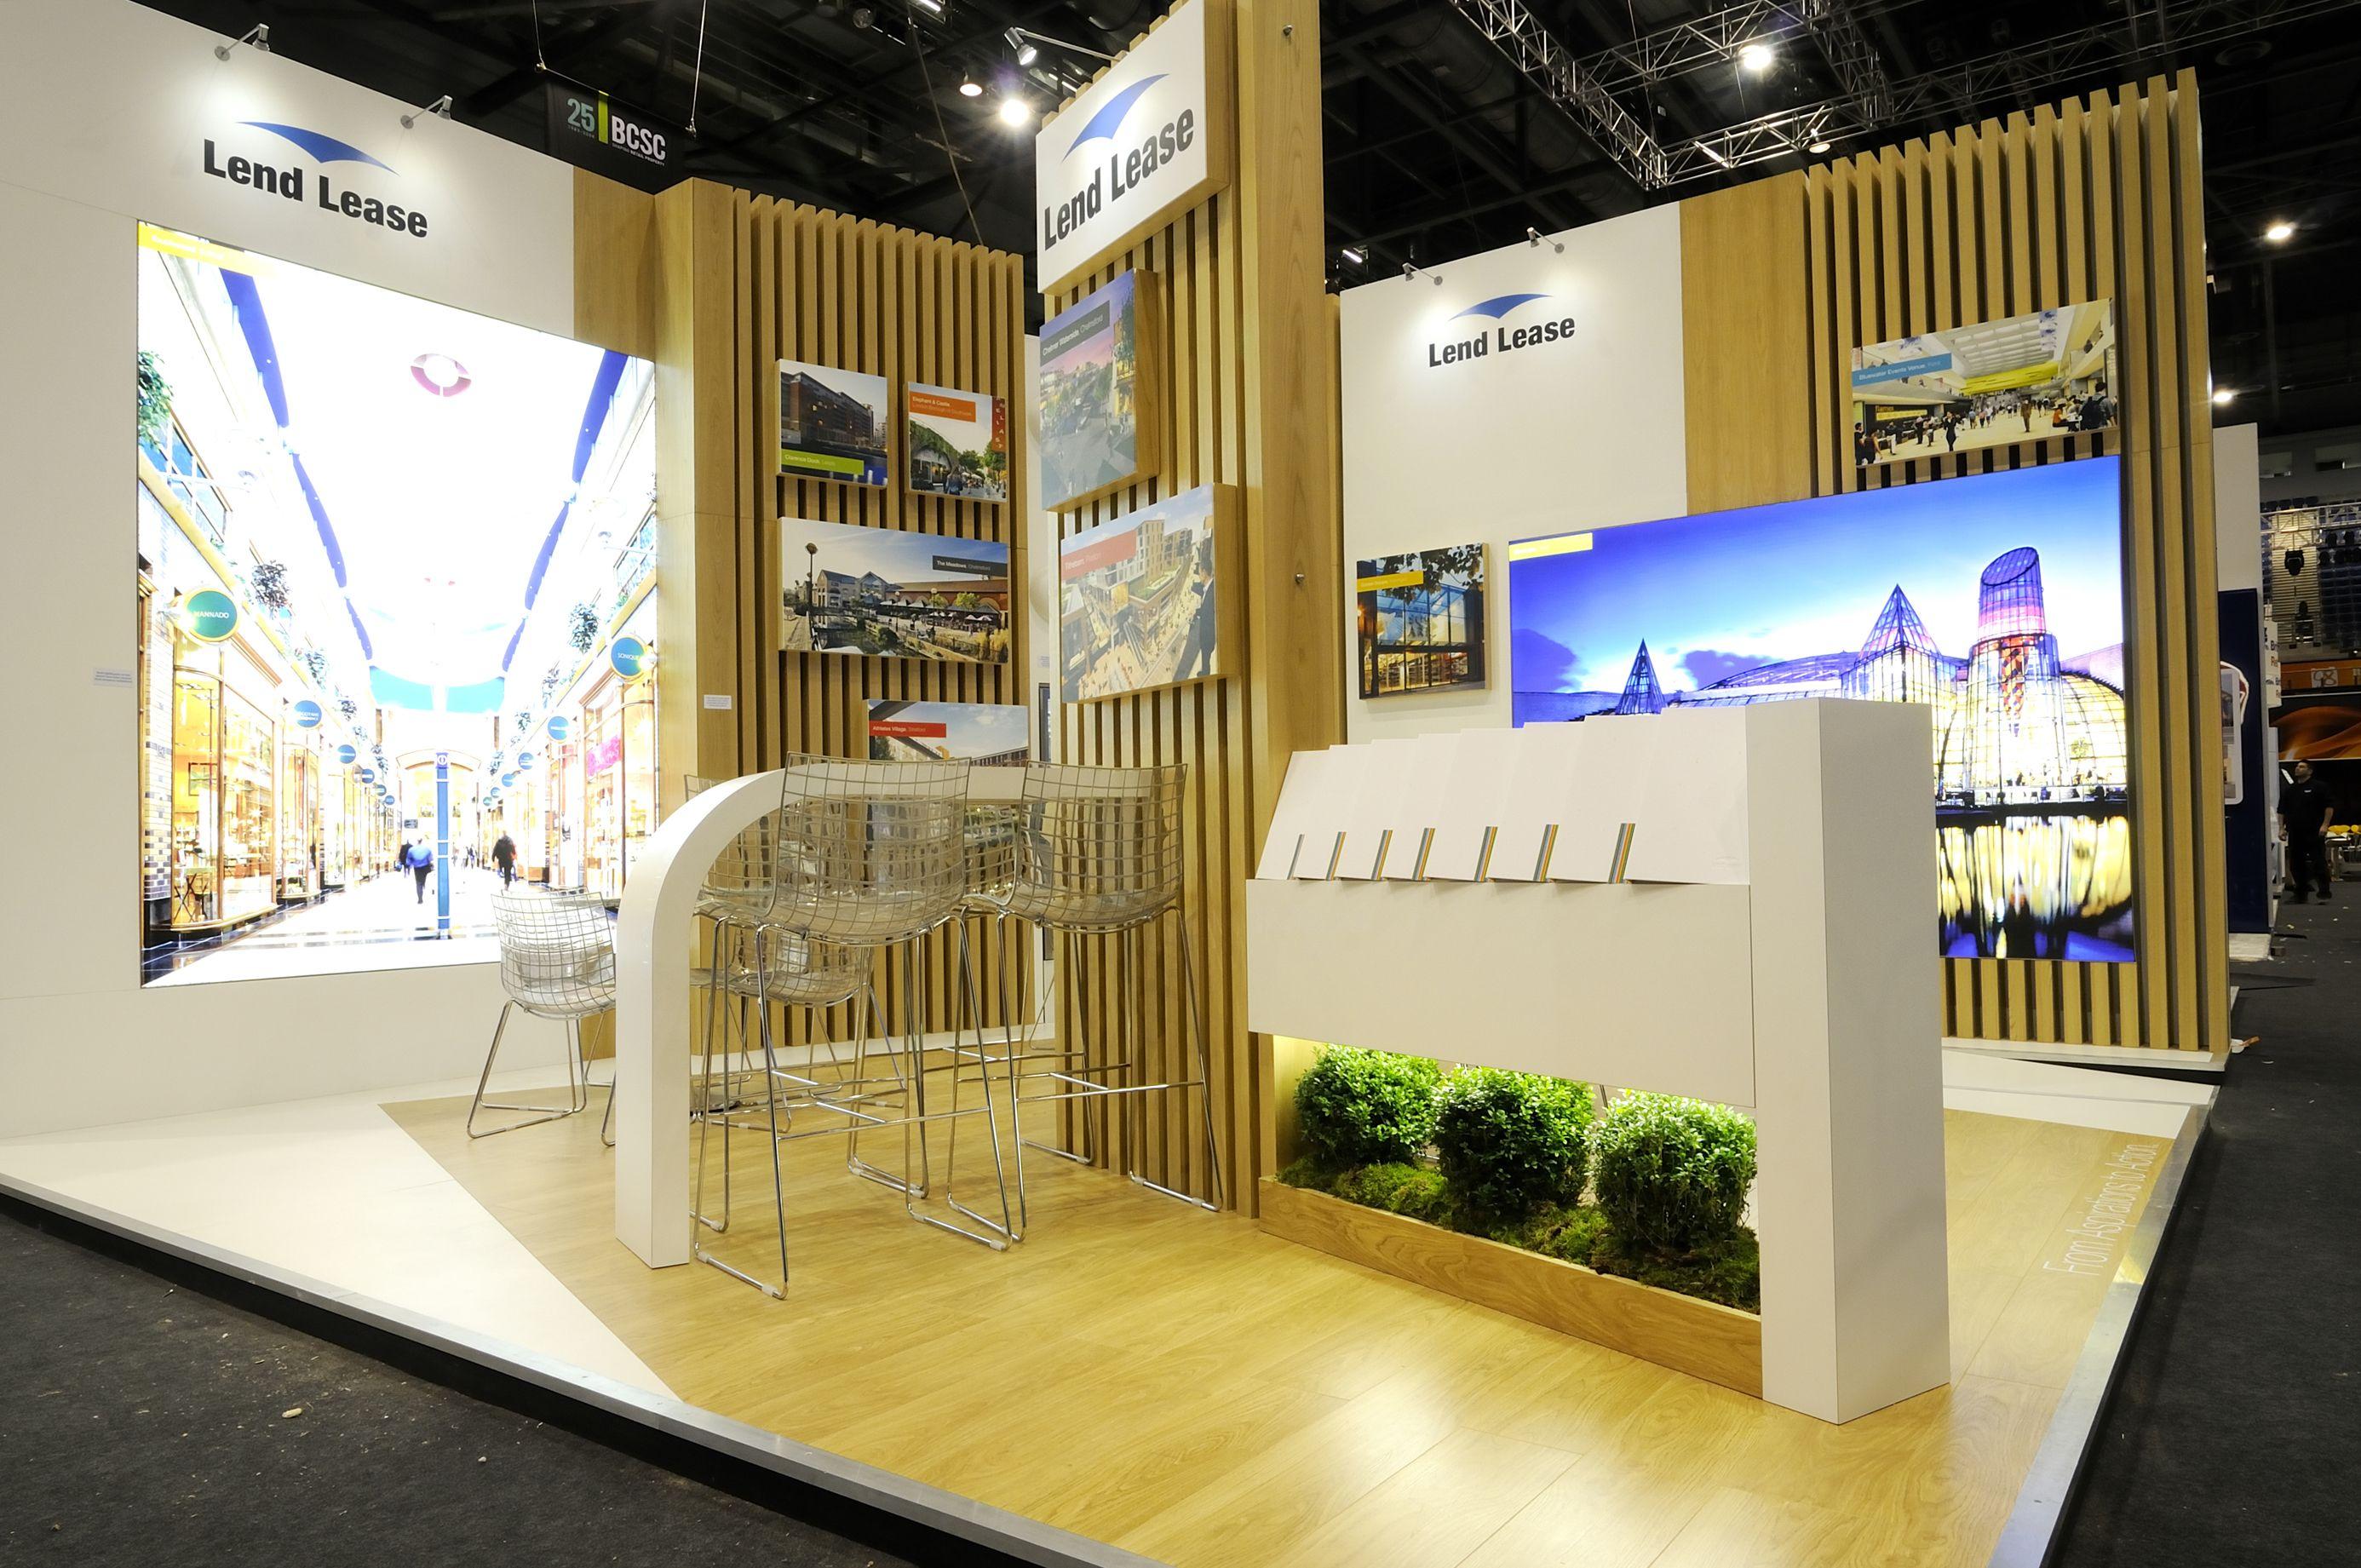 Exhibition Stand Design Best Practice : Lend lease exhibition stand by sovereign exhibitions